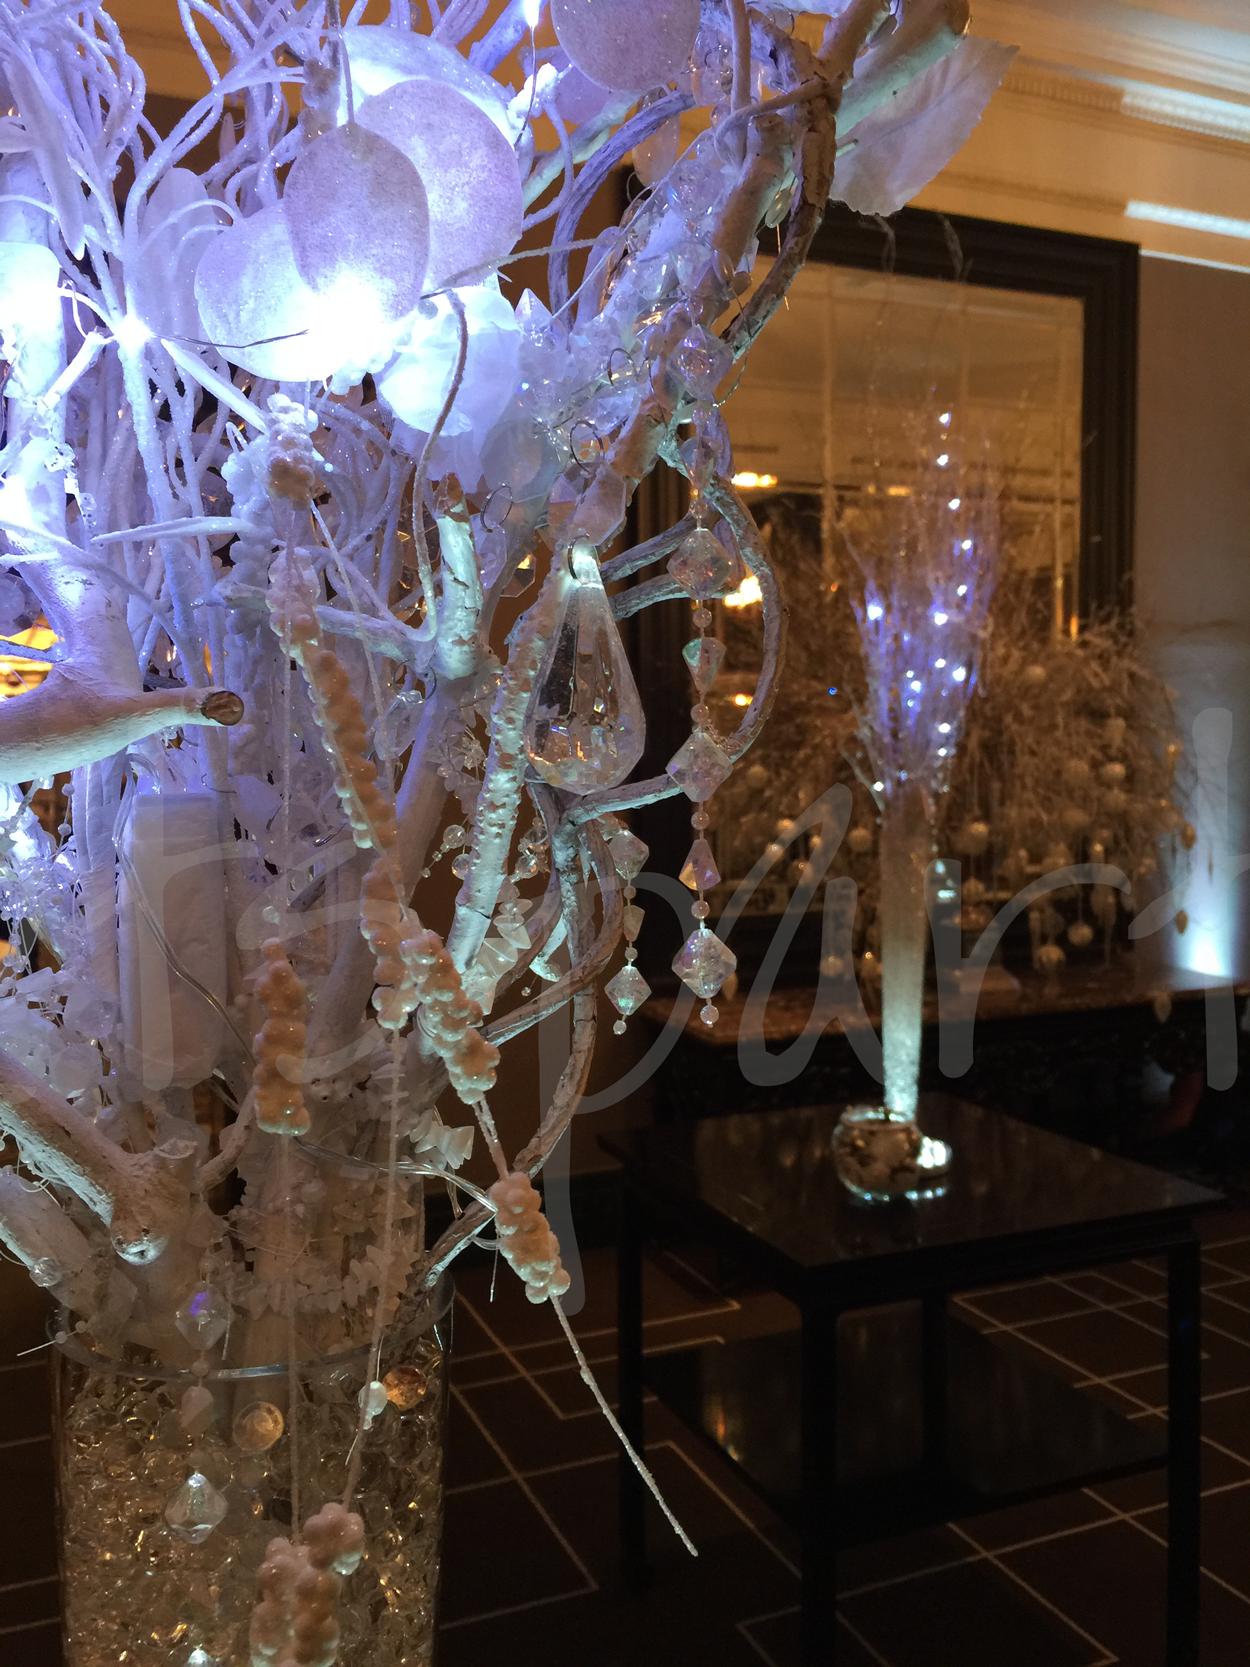 myriad-crystals-table-decoration-hire